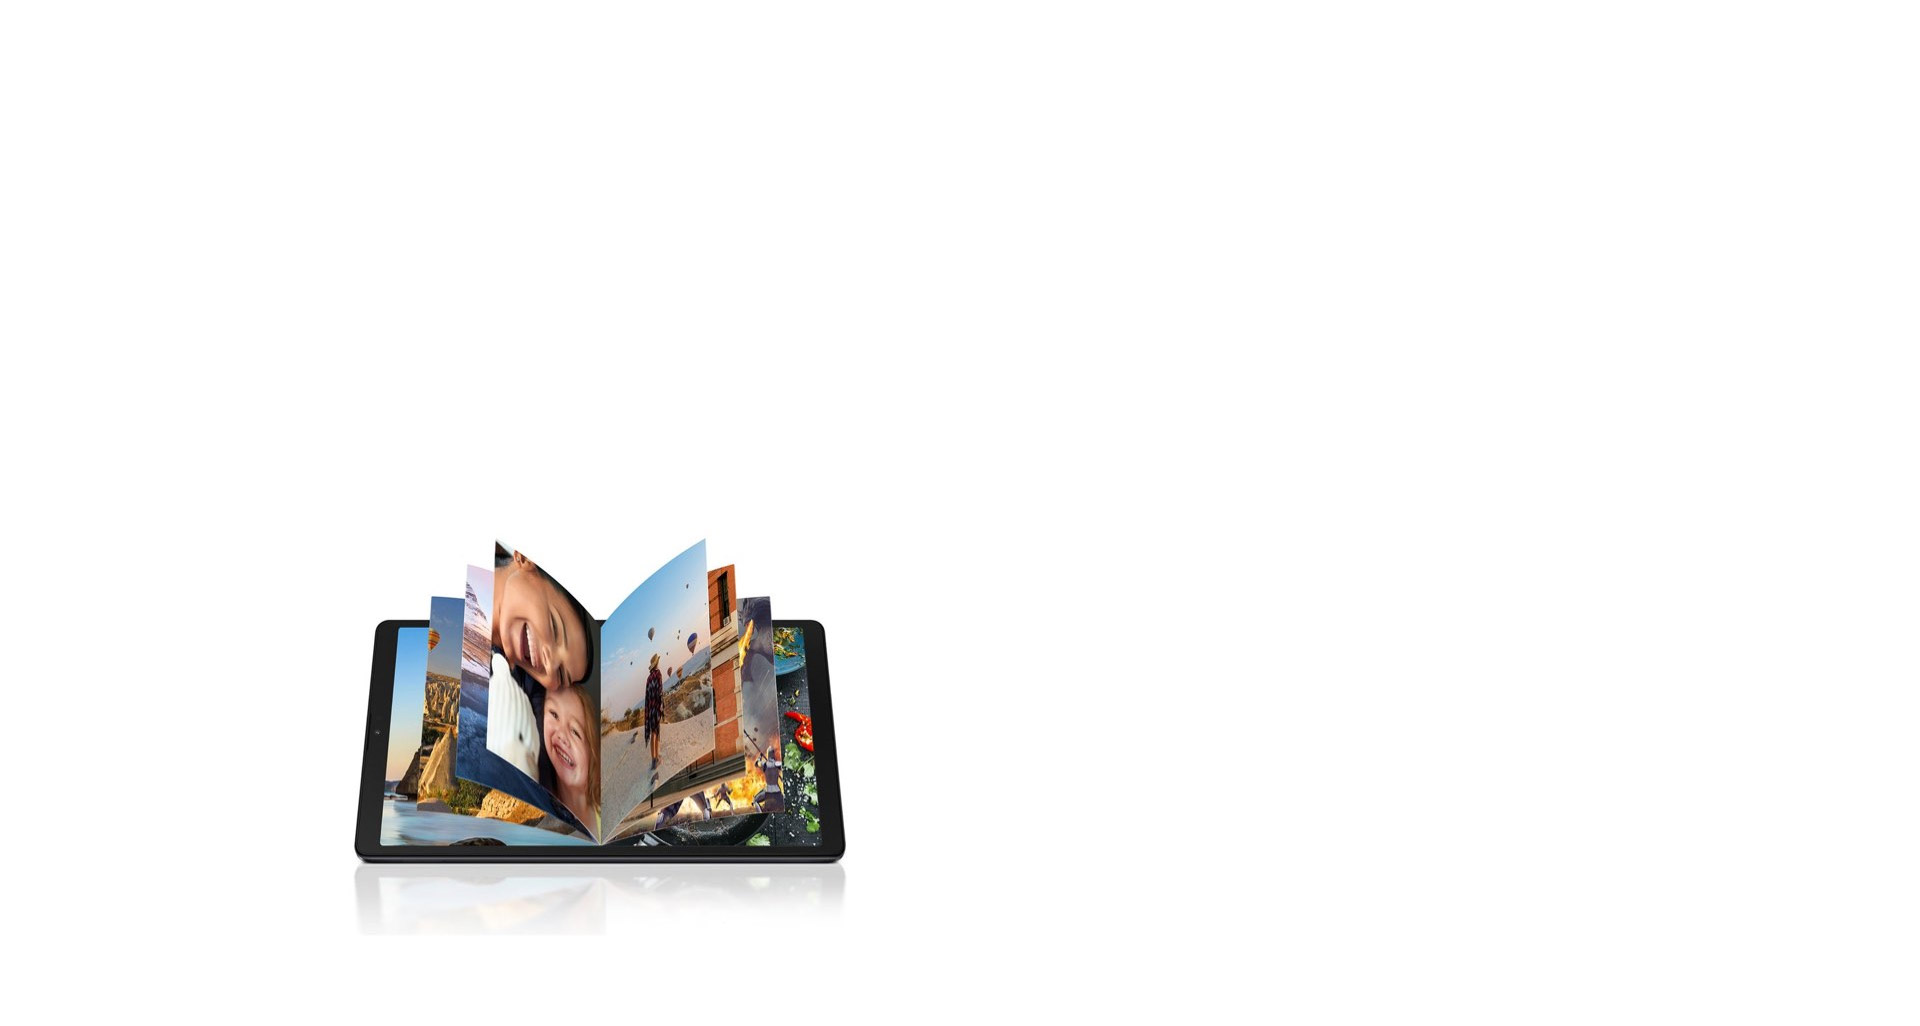 قیمت Galaxy Tab A7 Lite